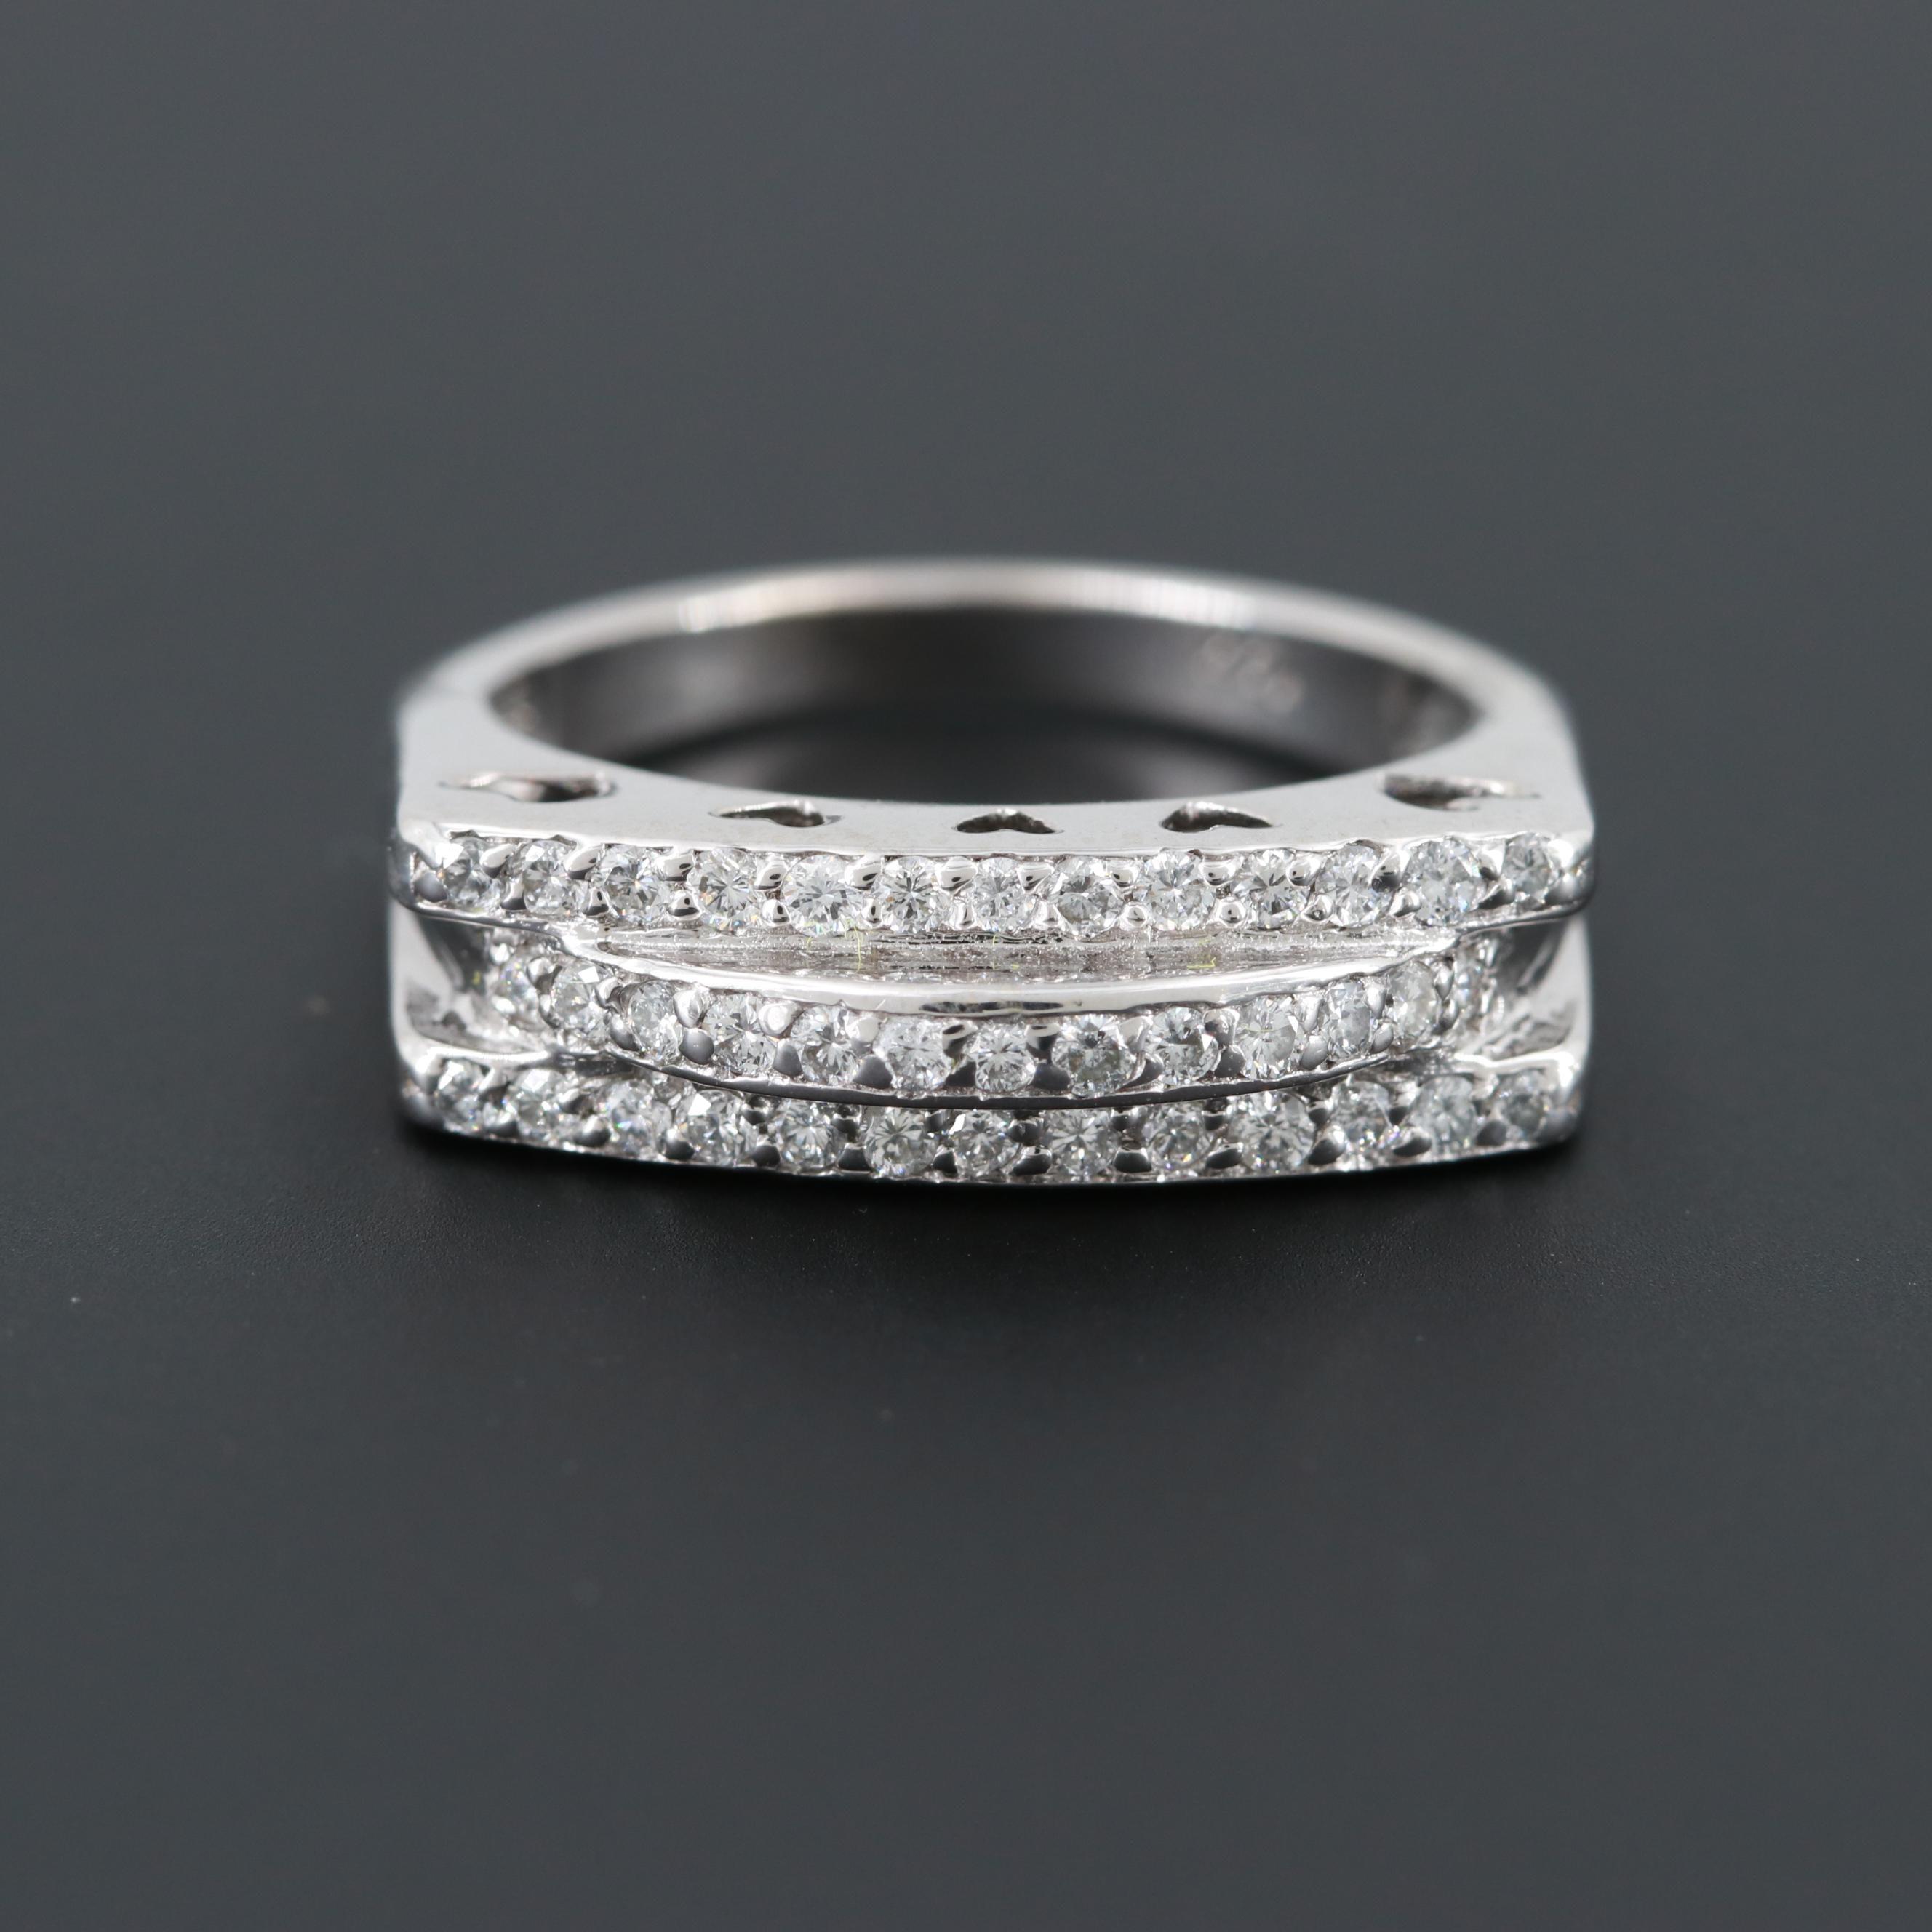 14K White Gold Diamond Ring with Heart Detail